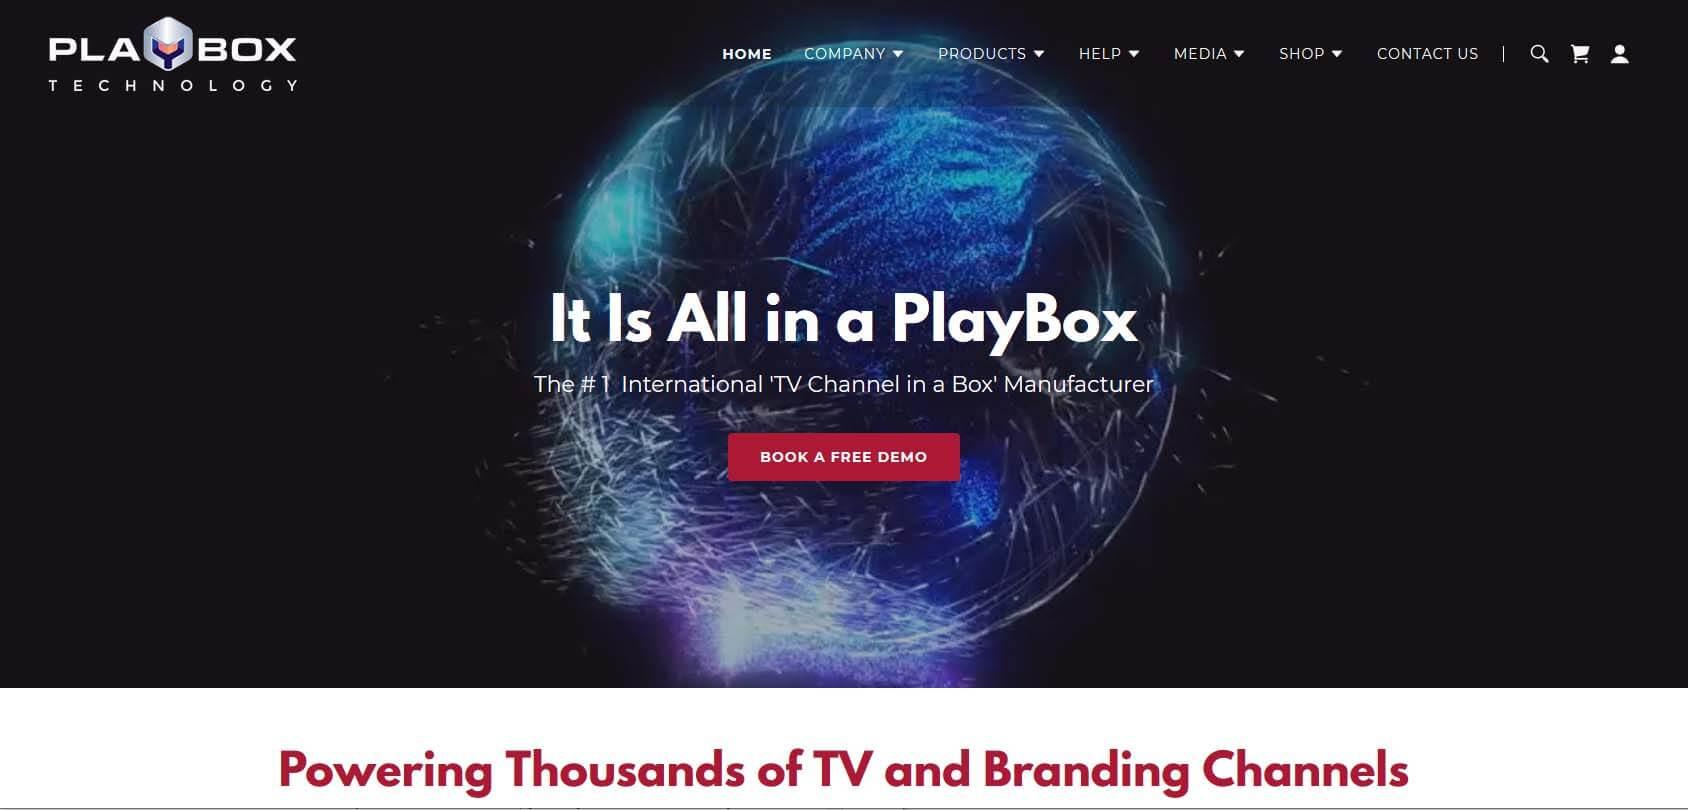 Playbox Technology Homepage